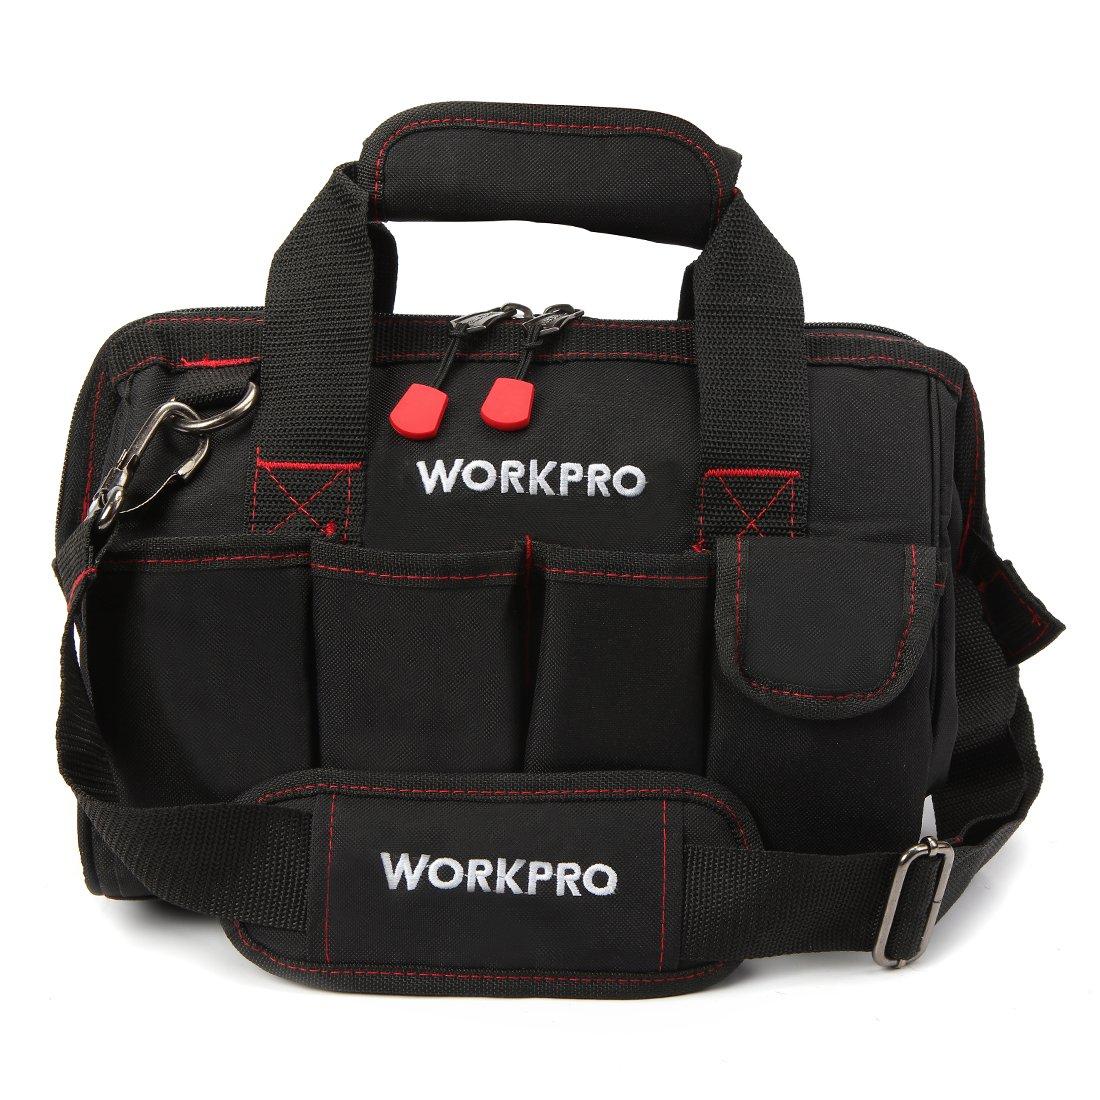 WORKPRO 工具袋 大口収納ツールバッグ